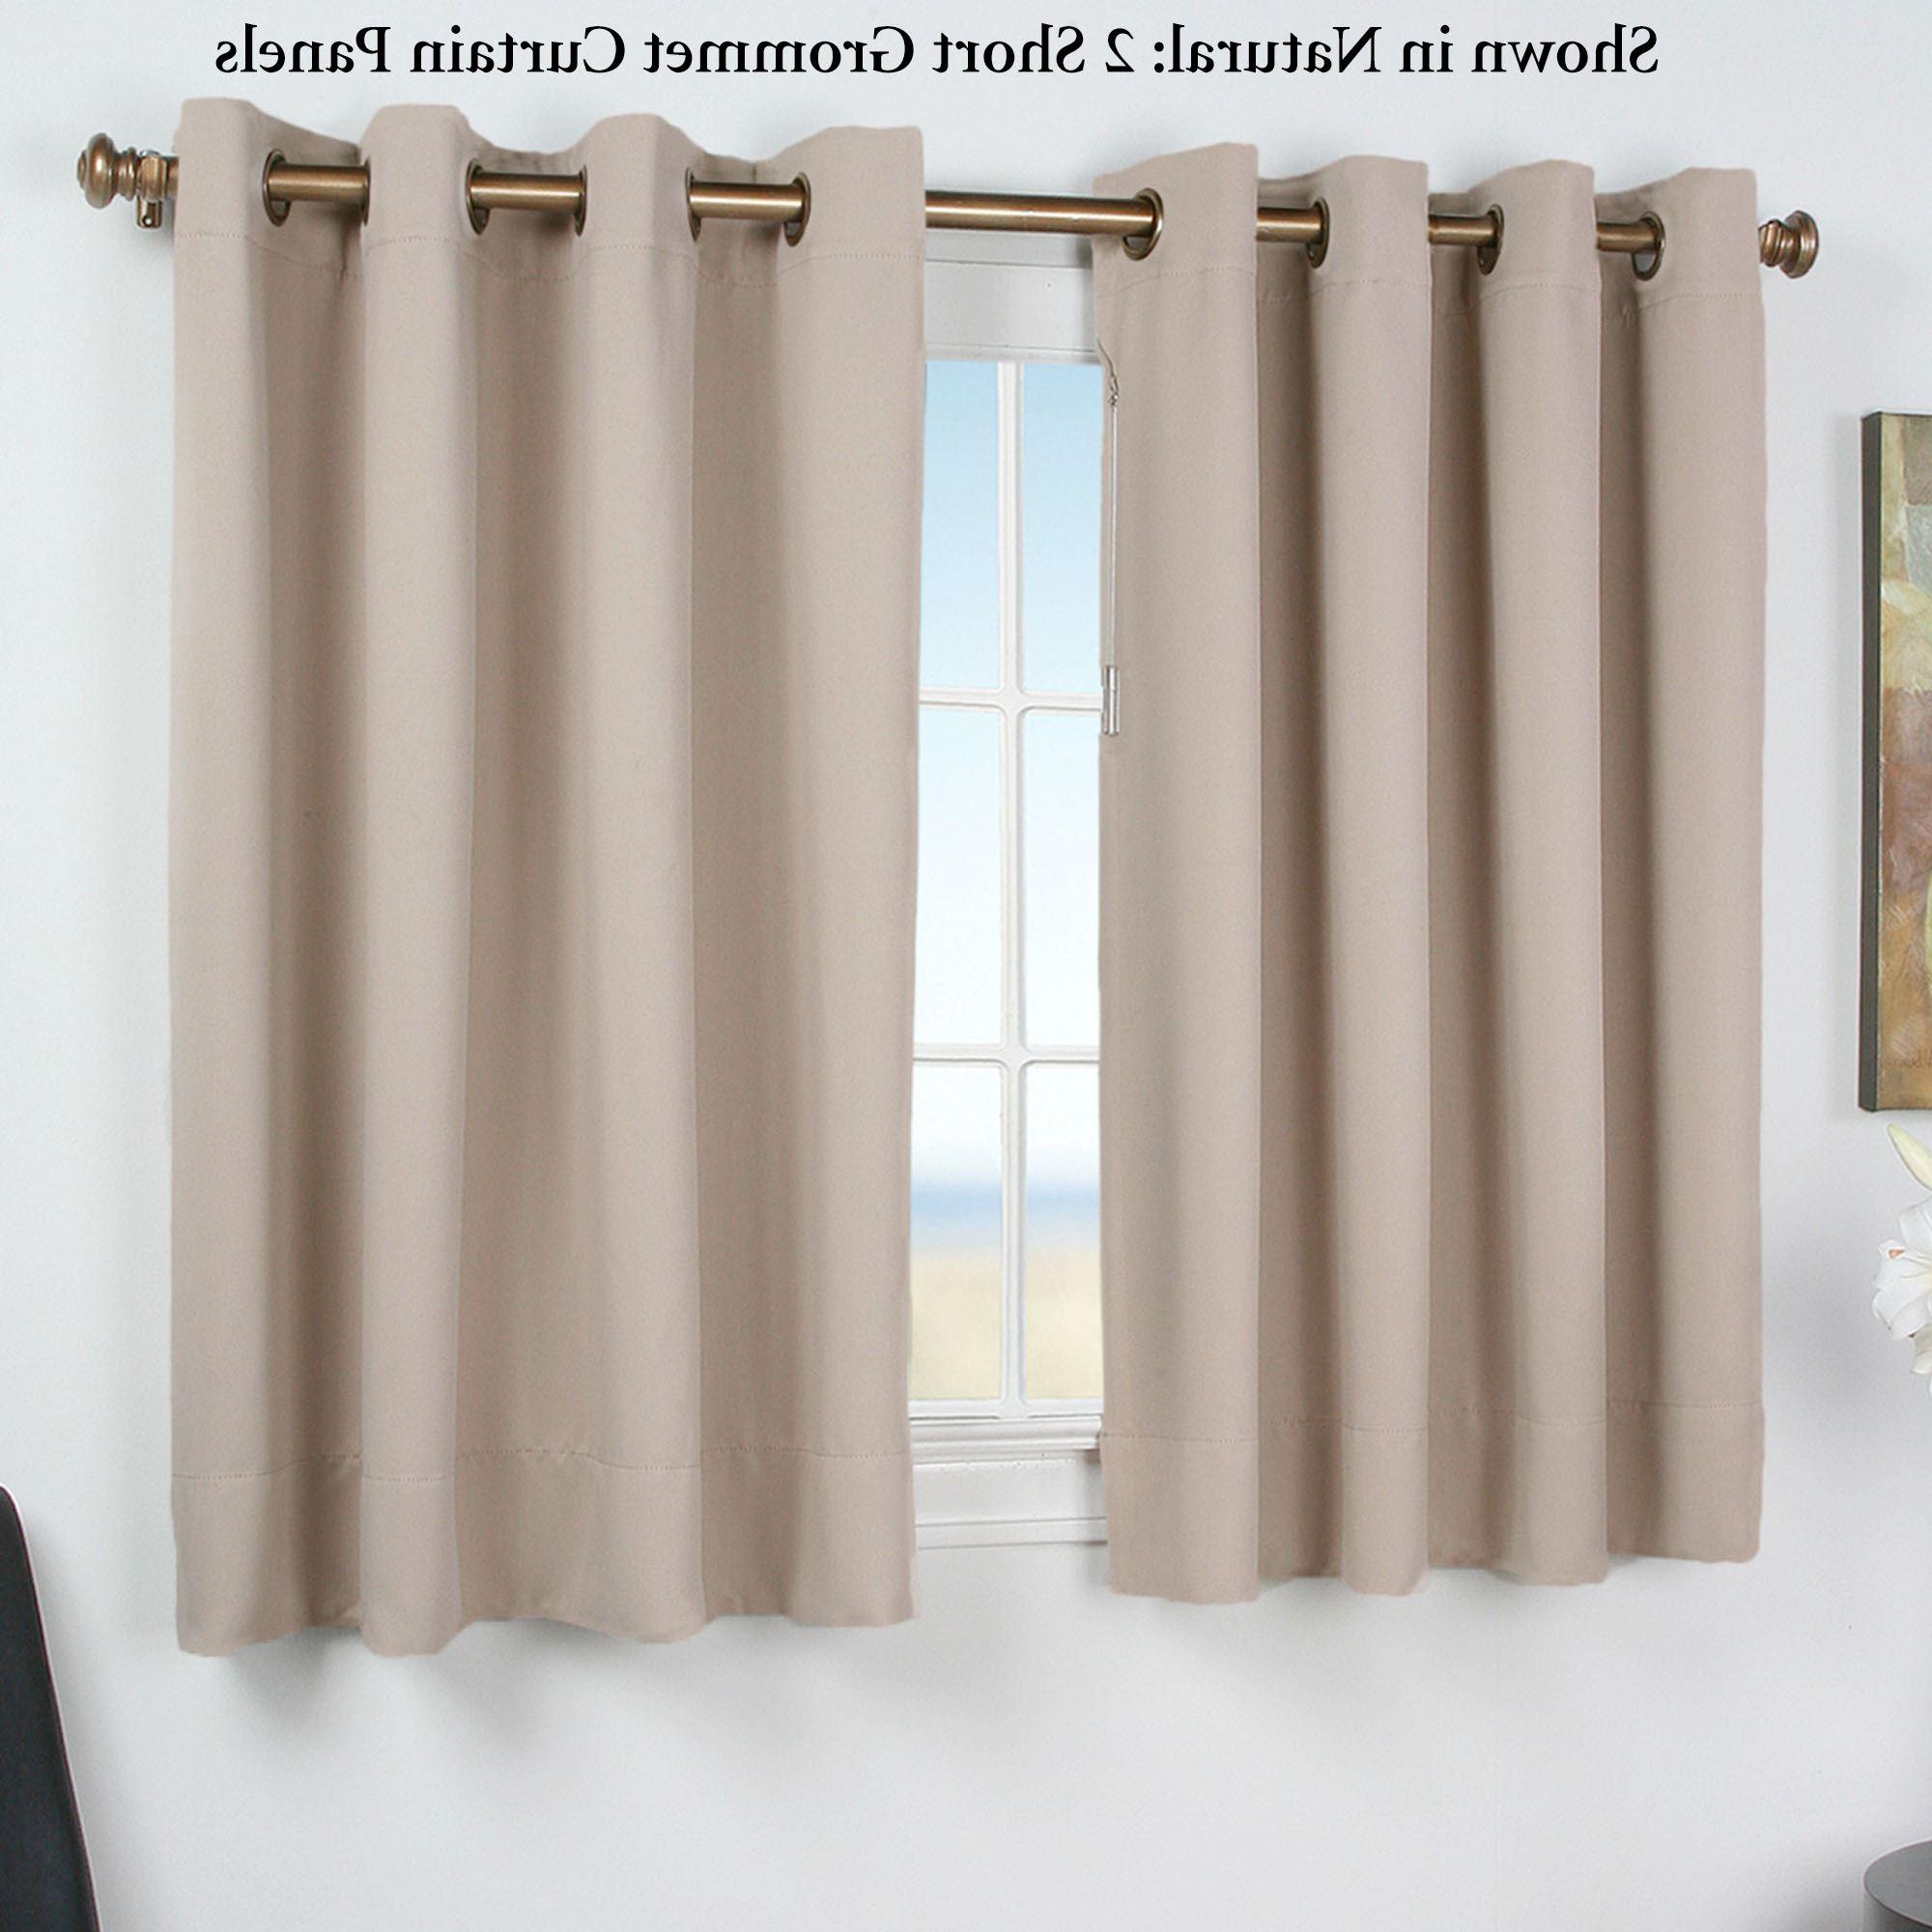 Preferred Ultimate Blackout Short Grommet Curtain Panel Regarding Grommet Curtain Panels (View 2 of 20)